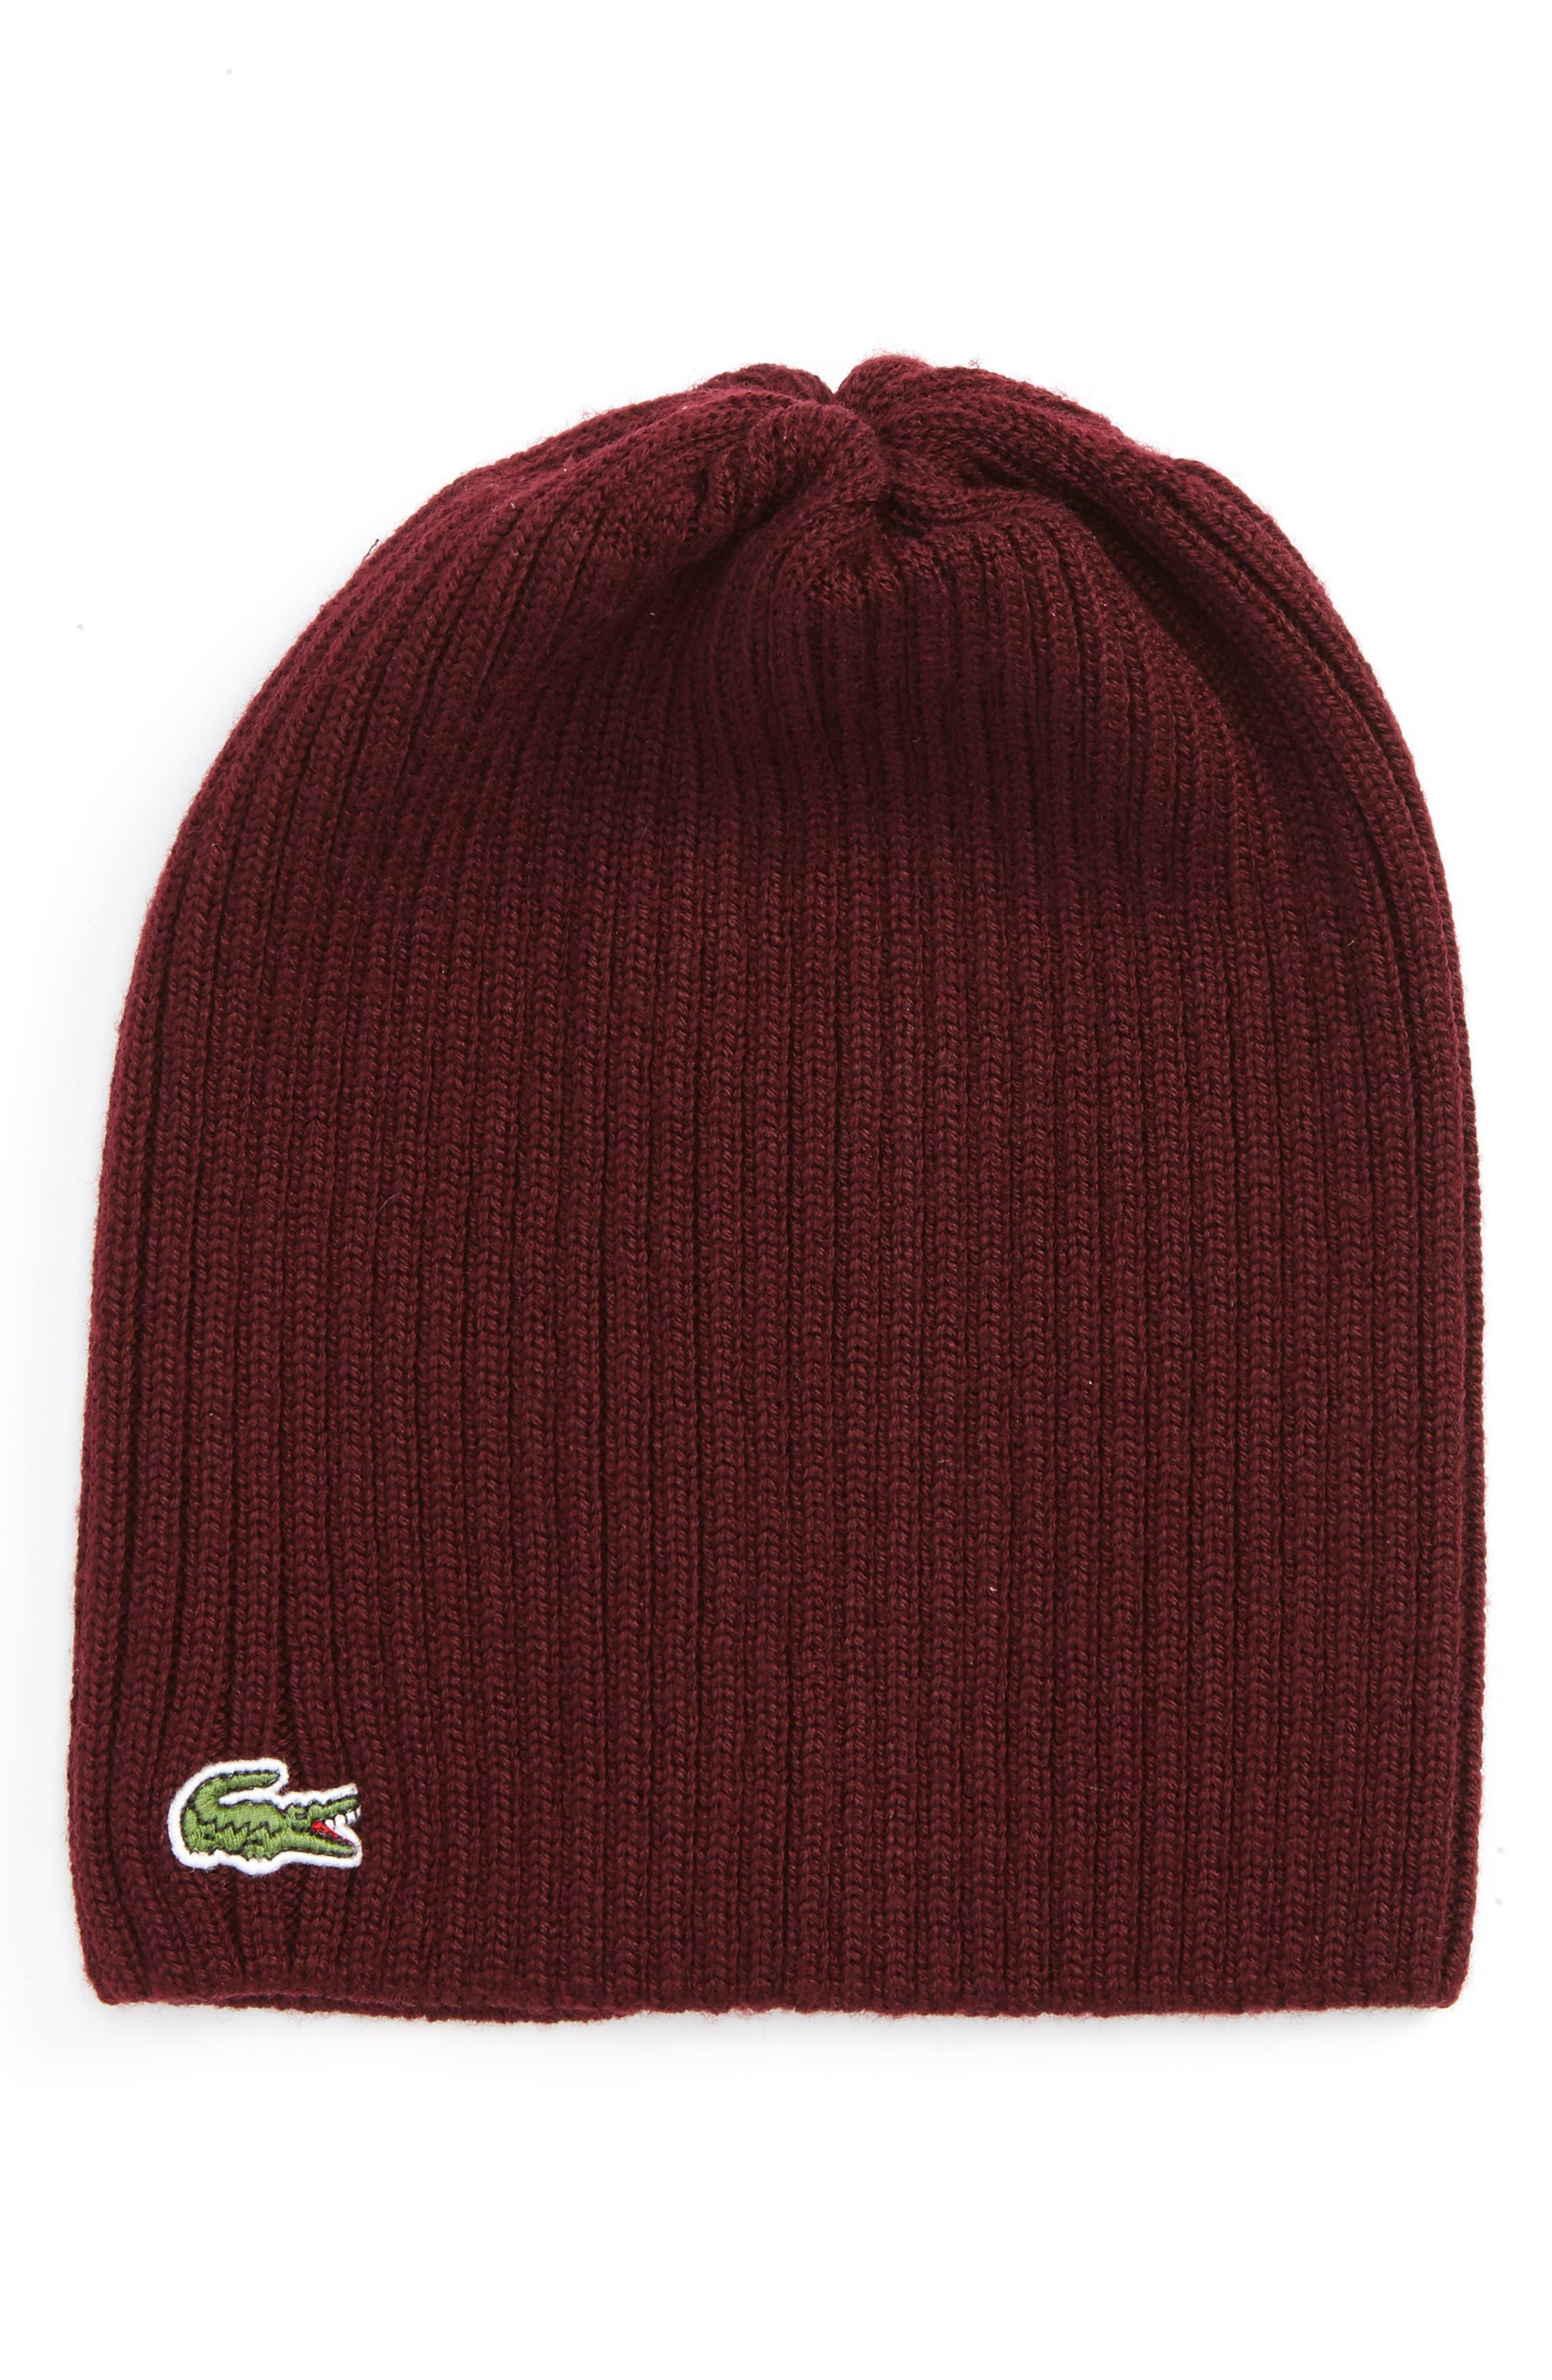 Main Image - Lacoste Rib Knit Wool Beanie